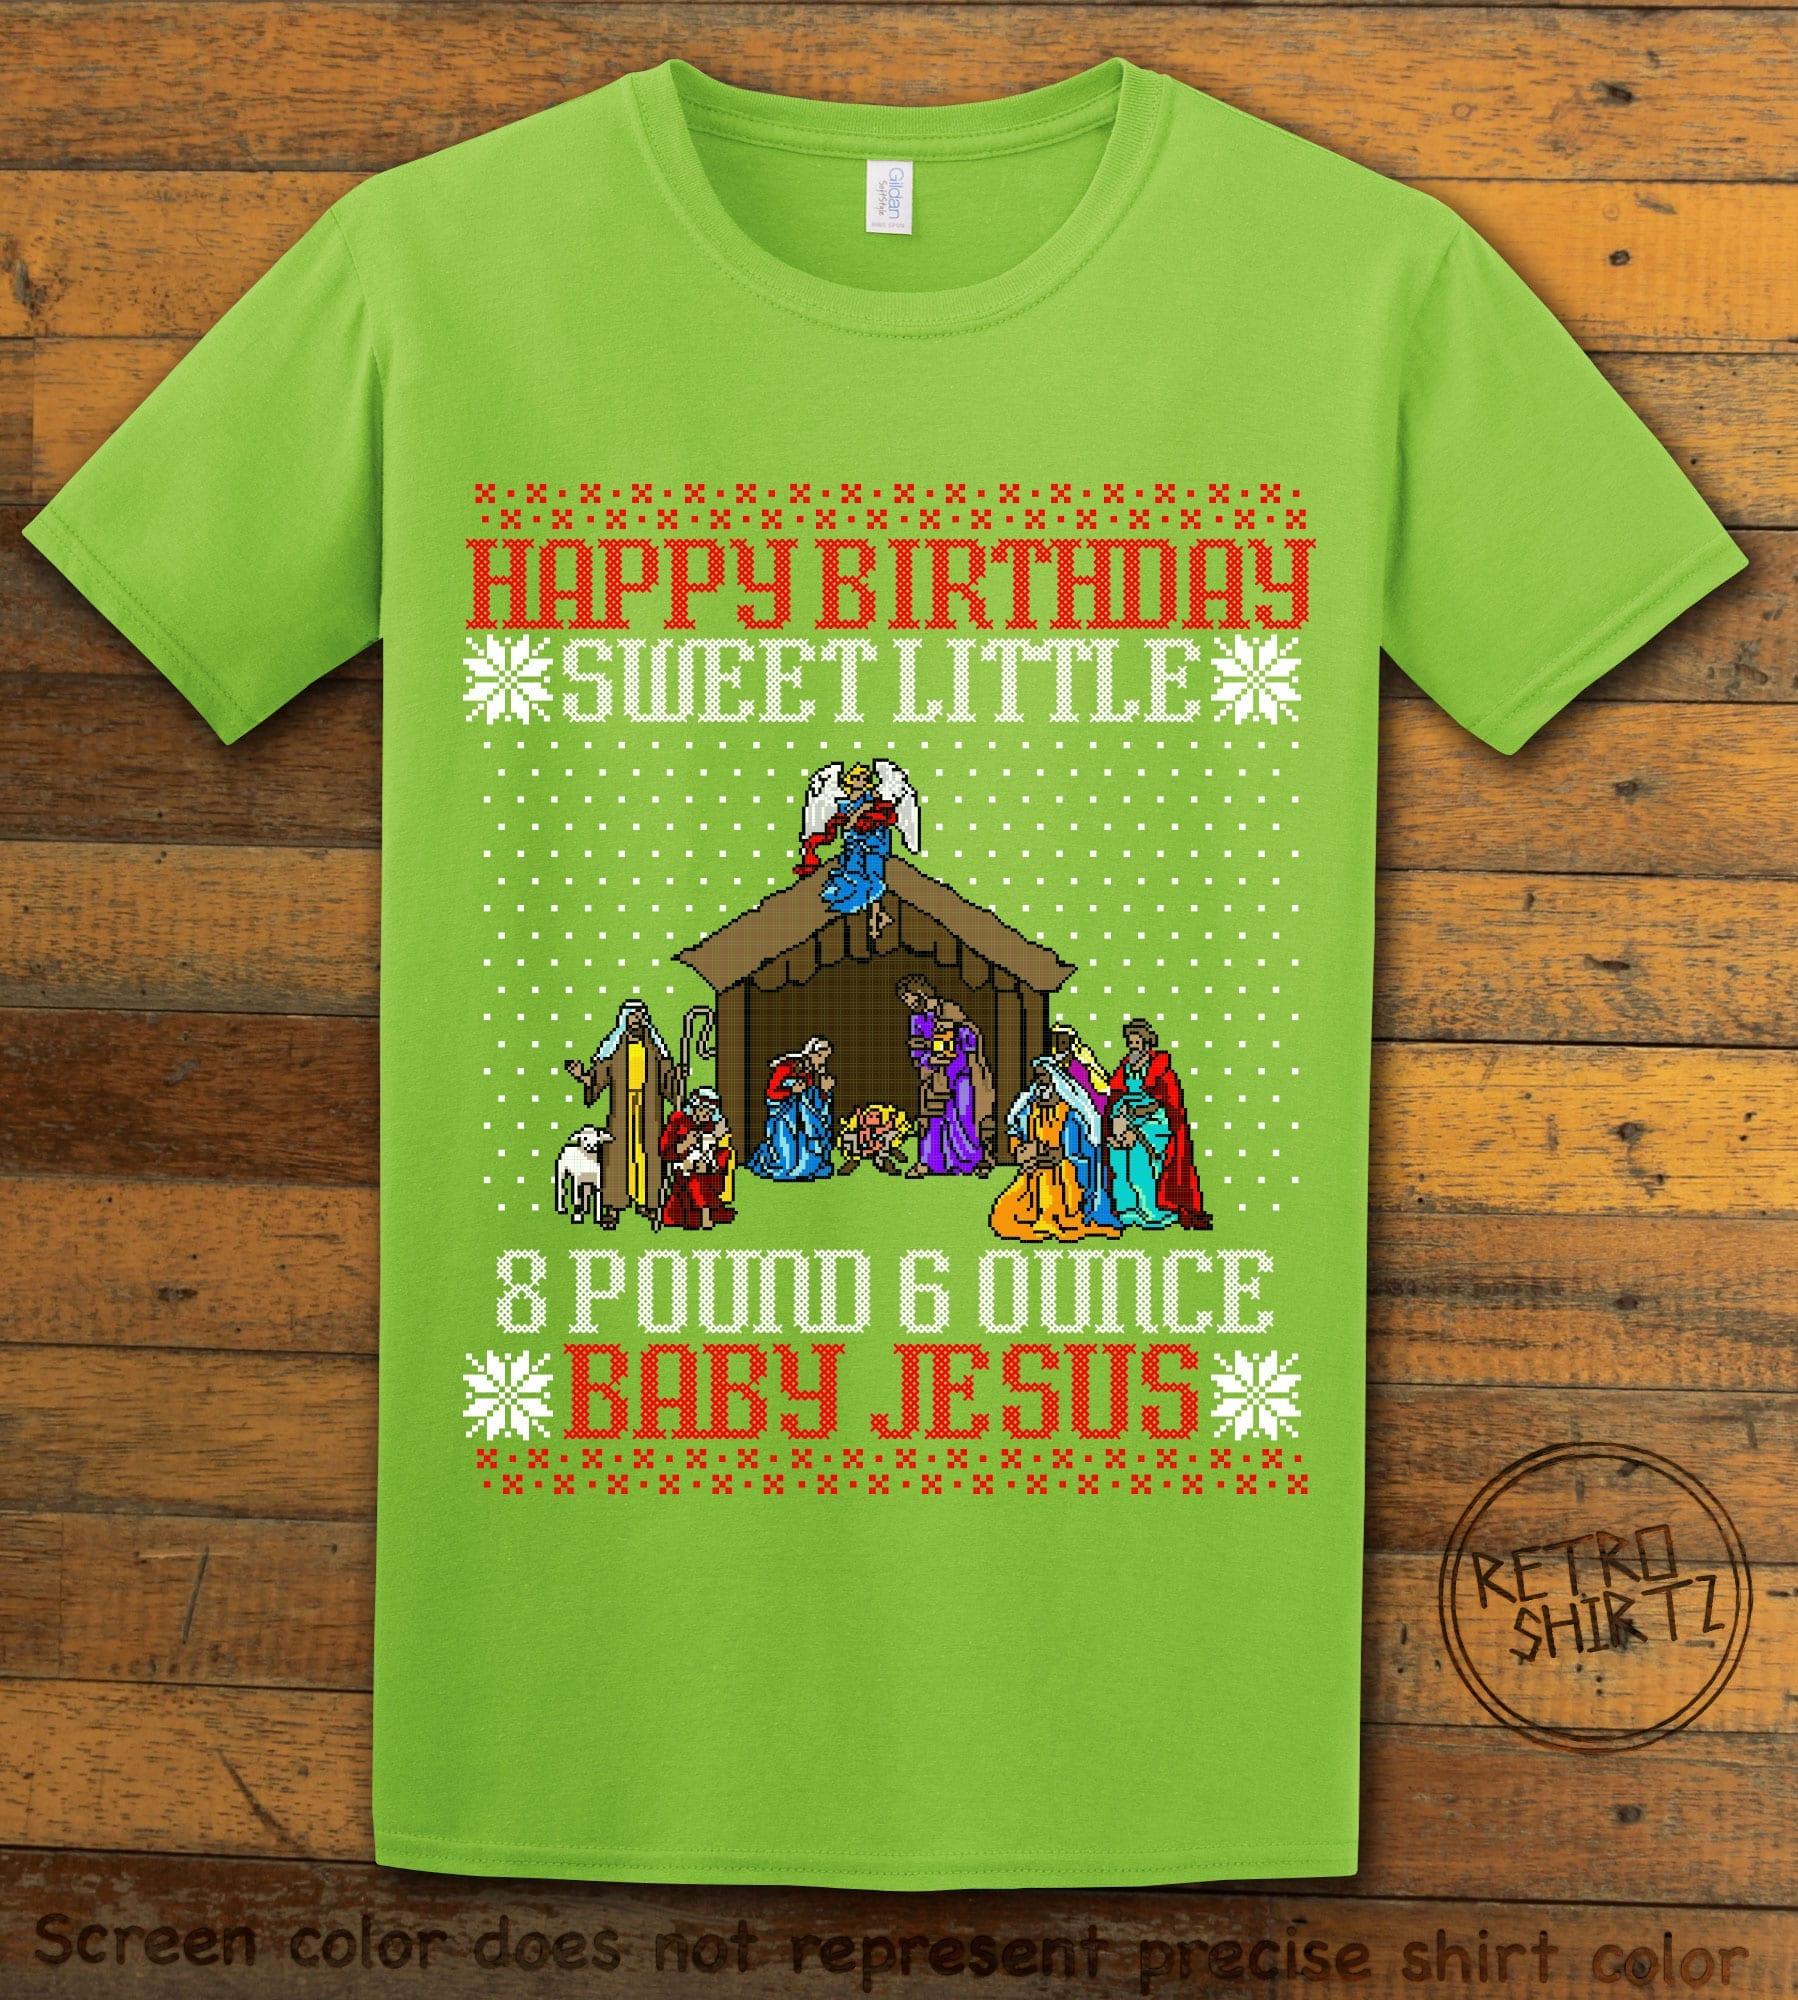 Happy Birthday Sweet Little Baby Jesus Christmas Graphic T-Shirt - lime shirt design